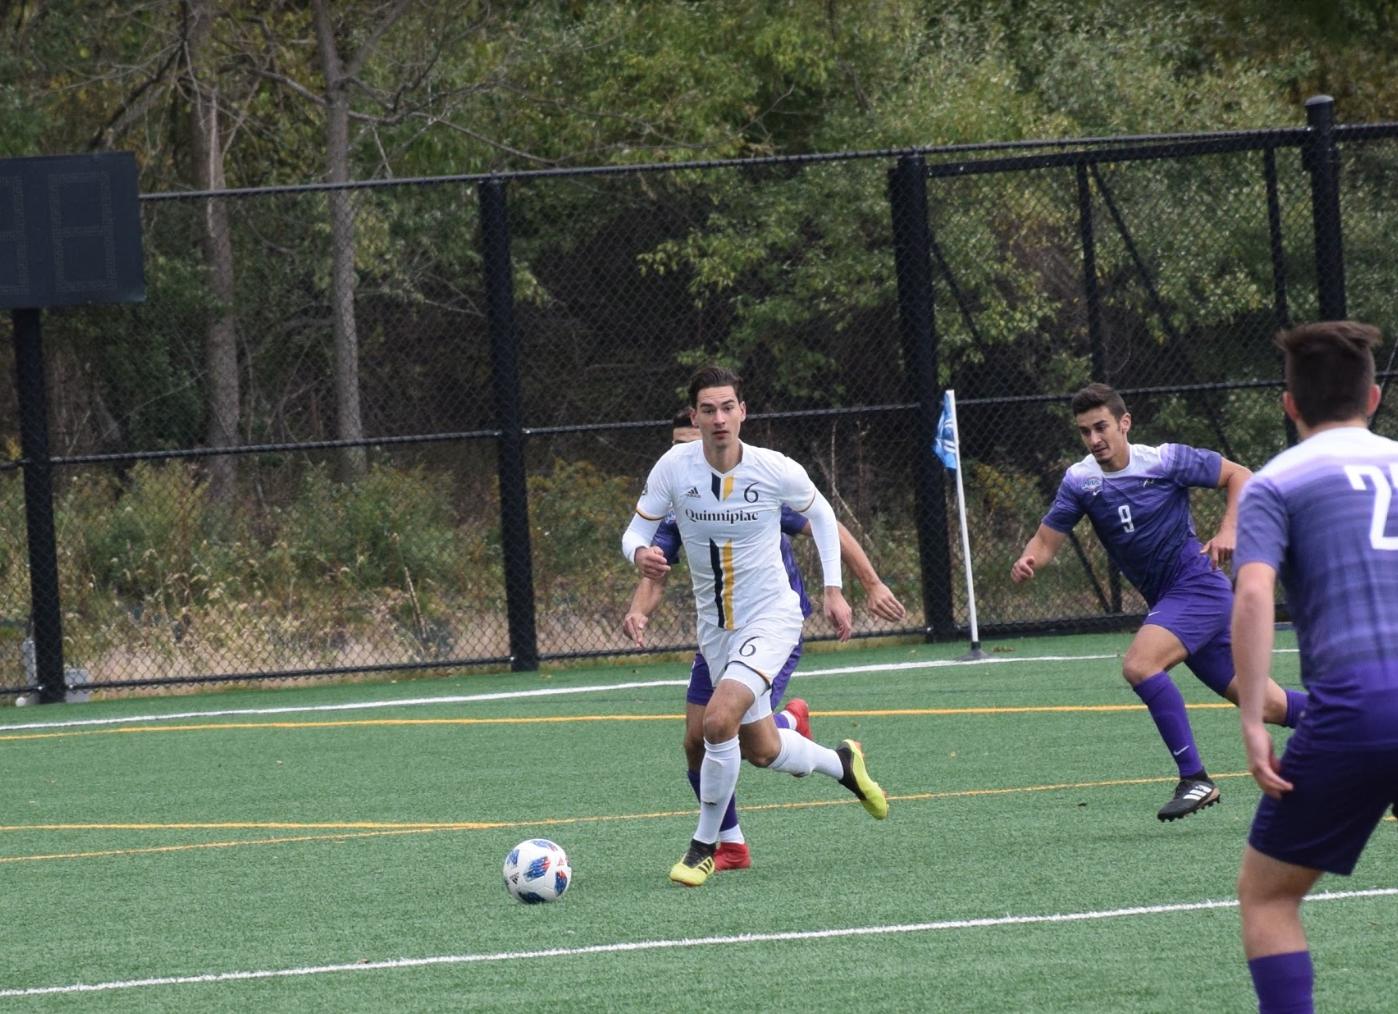 Quinnipiac men's soccer trounces Niagara, 3-0